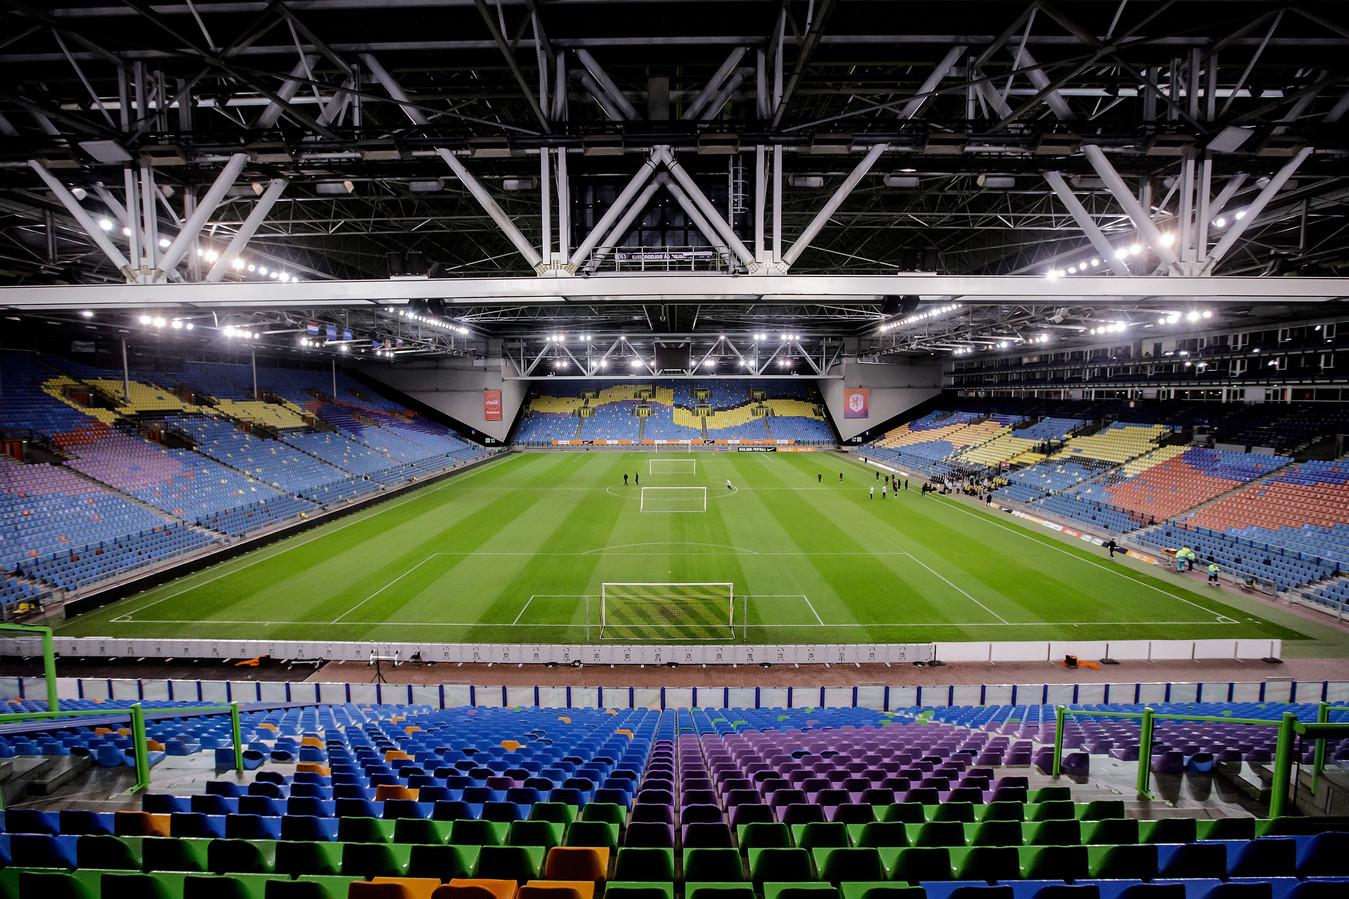 11-11-2019 Stadion Vitesse Gelredome interieur  NETHERLANDS, BELGIUM, LUXEMBURG ONLY COPYRIGHT BSR/SOCCRATES